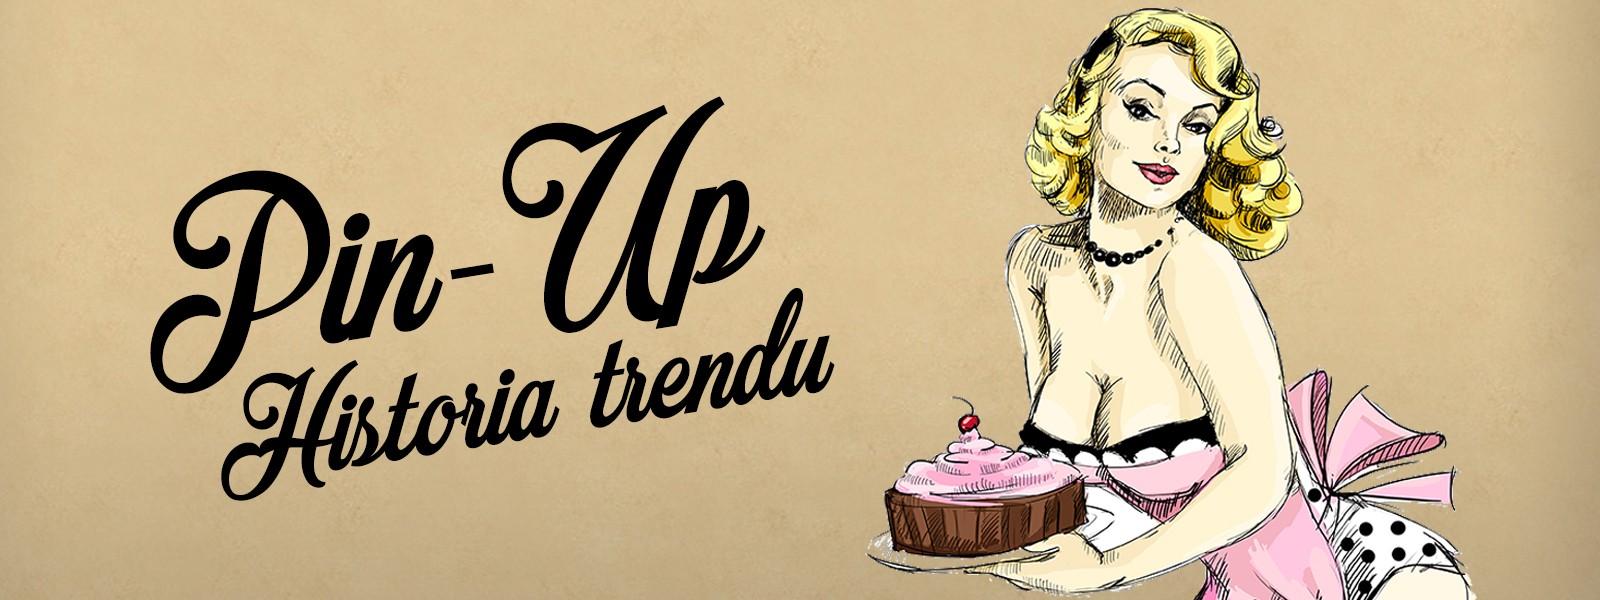 Pin Up - historia trendu